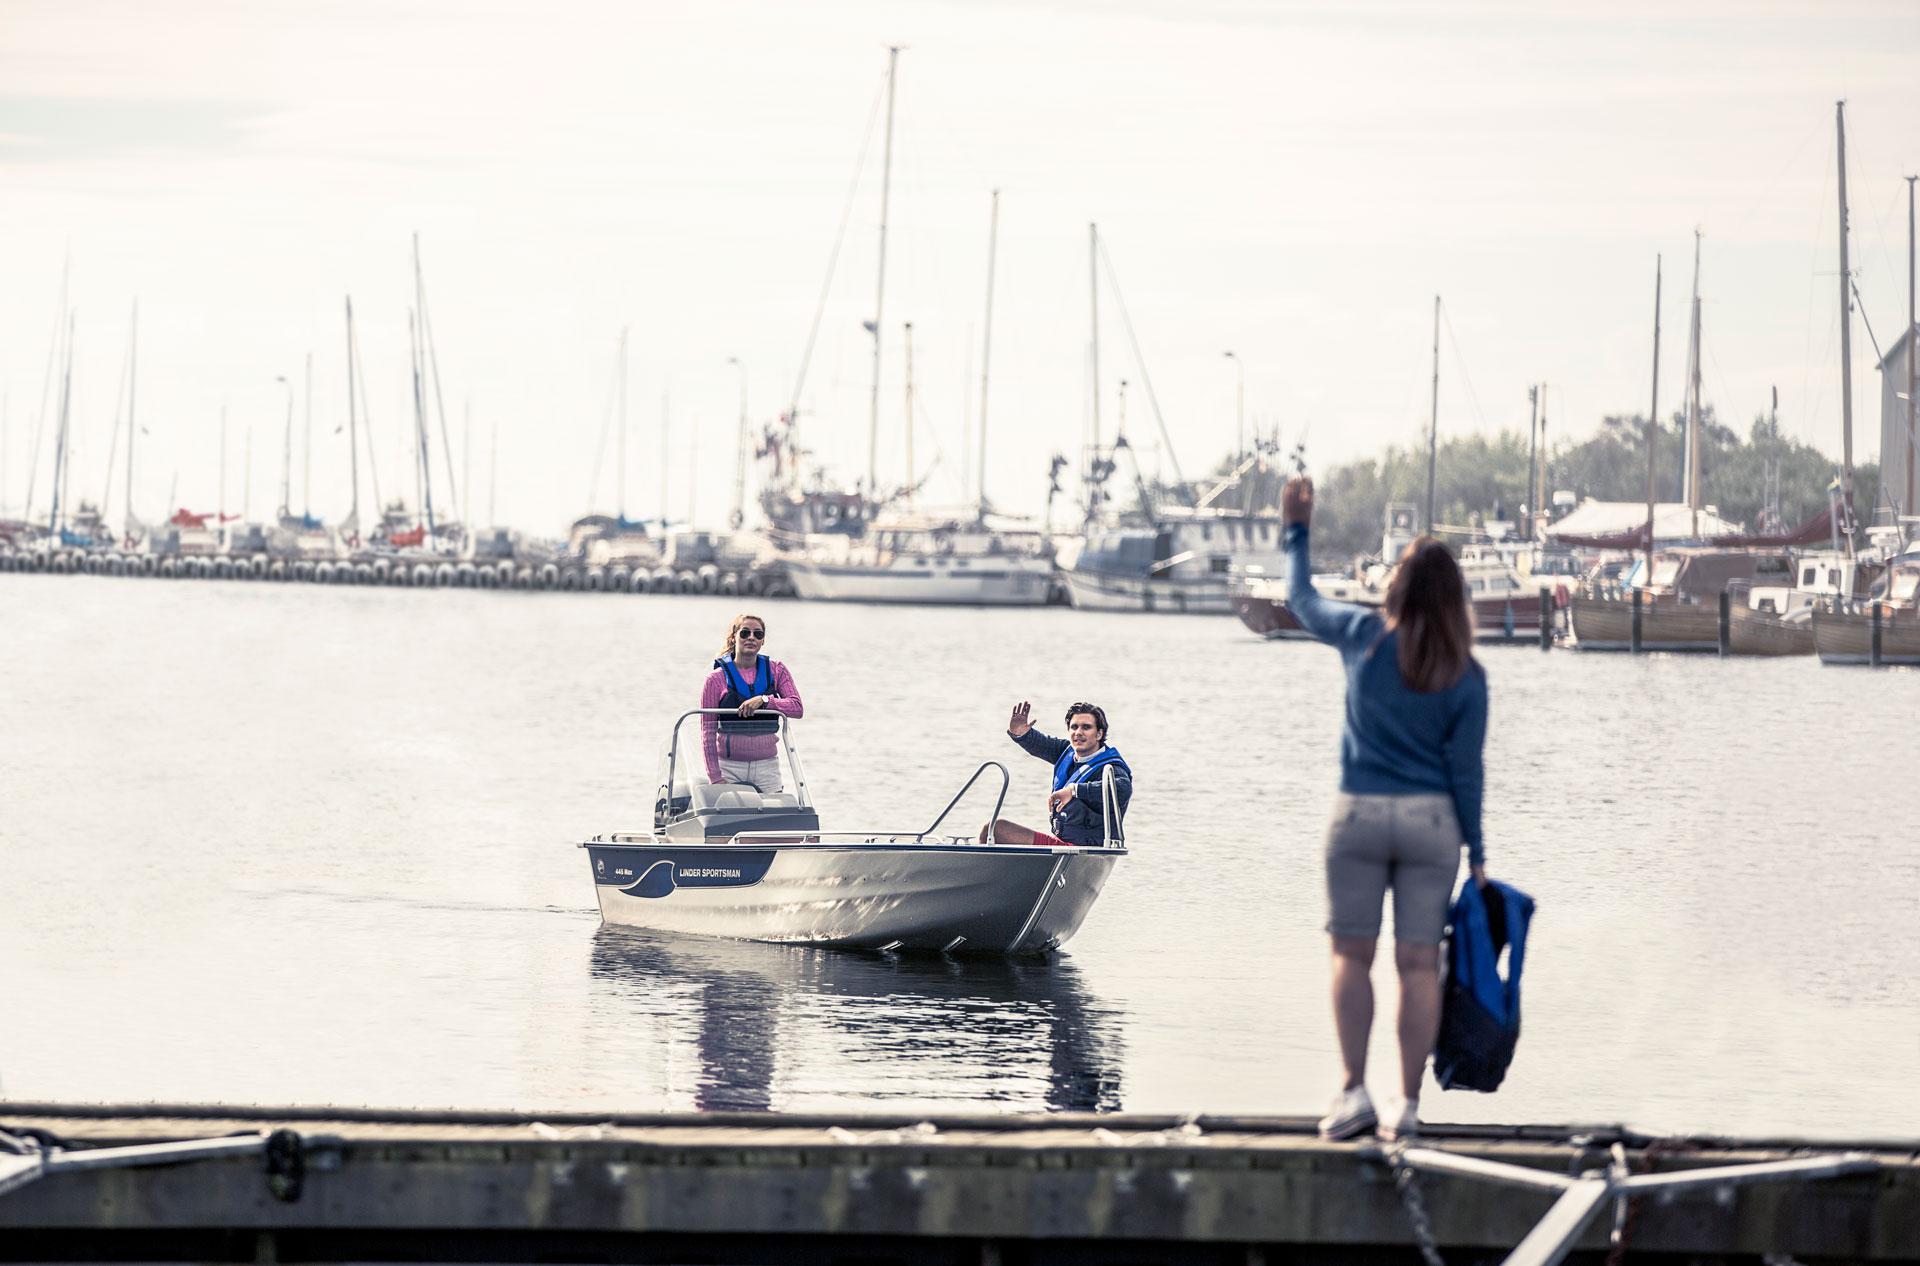 båt-sportsman445